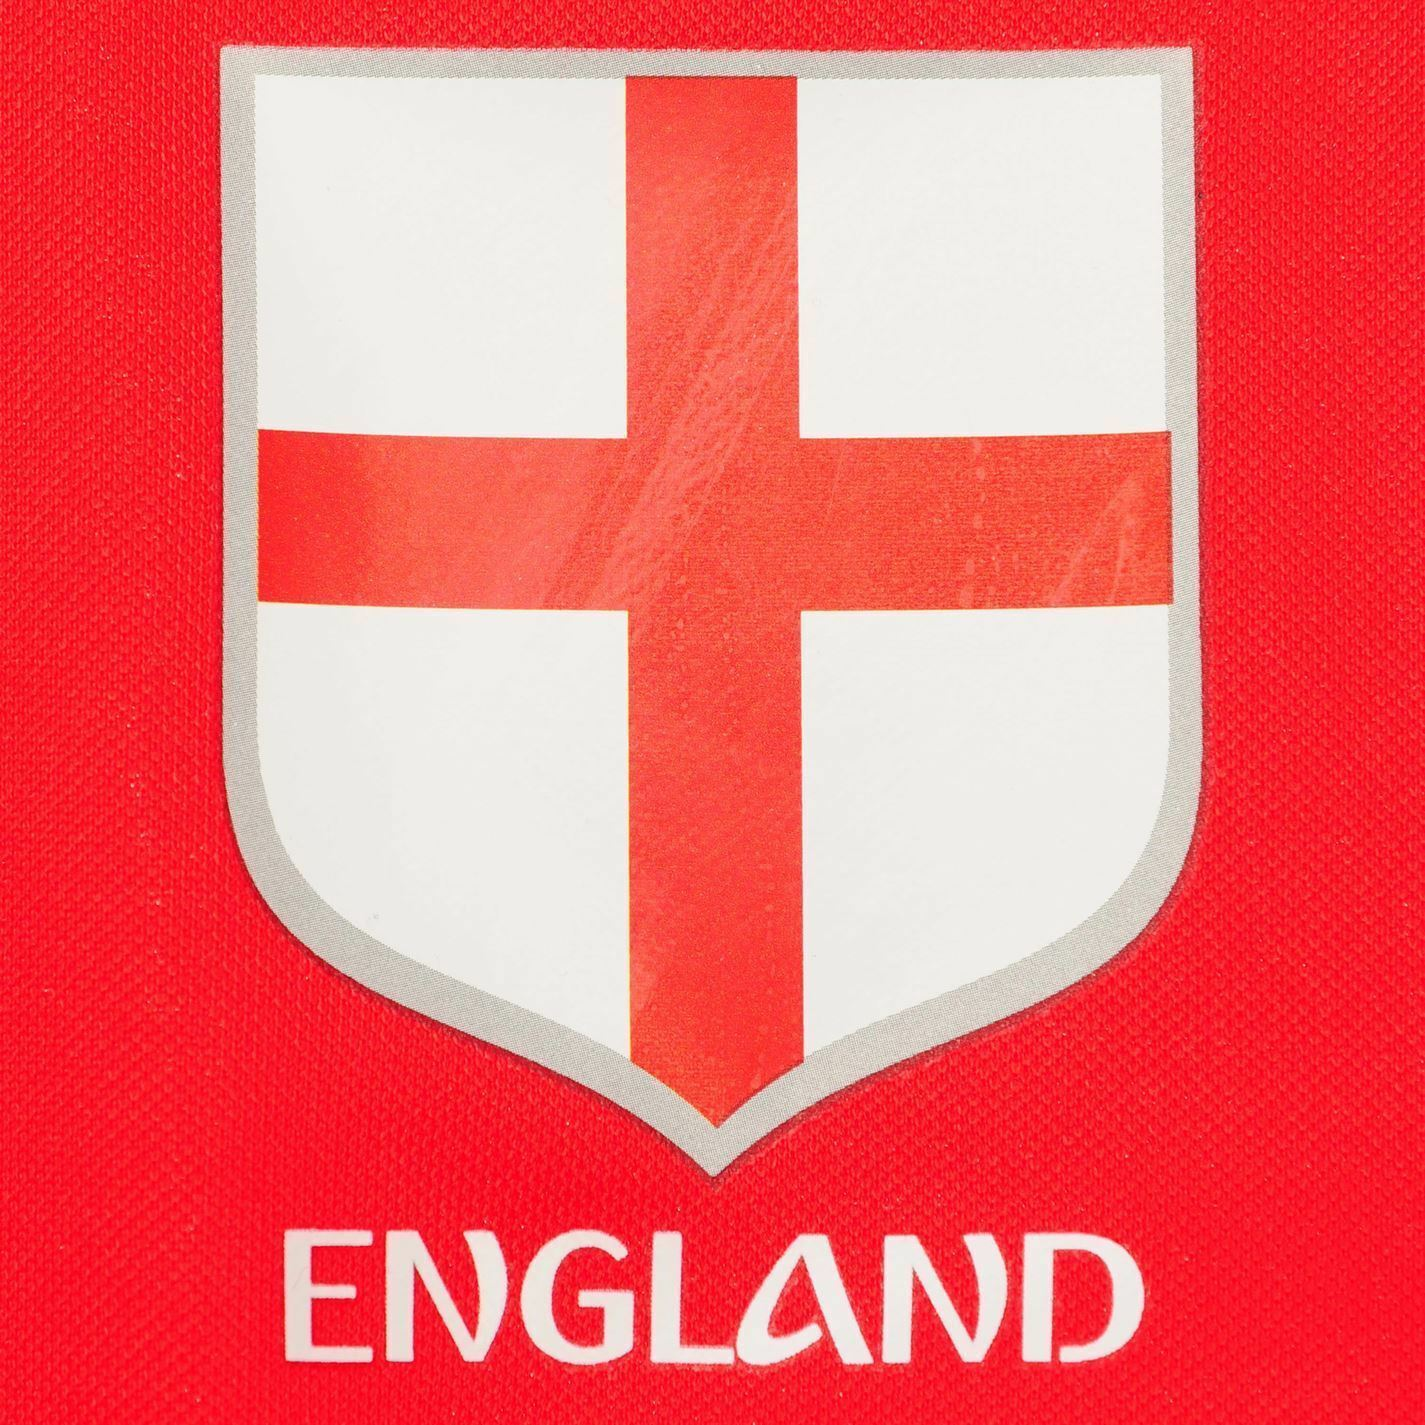 miniature 4 - FIFA Coupe du monde 2018 Angleterre T-Shirt Homme Football Soccer tee shirt top